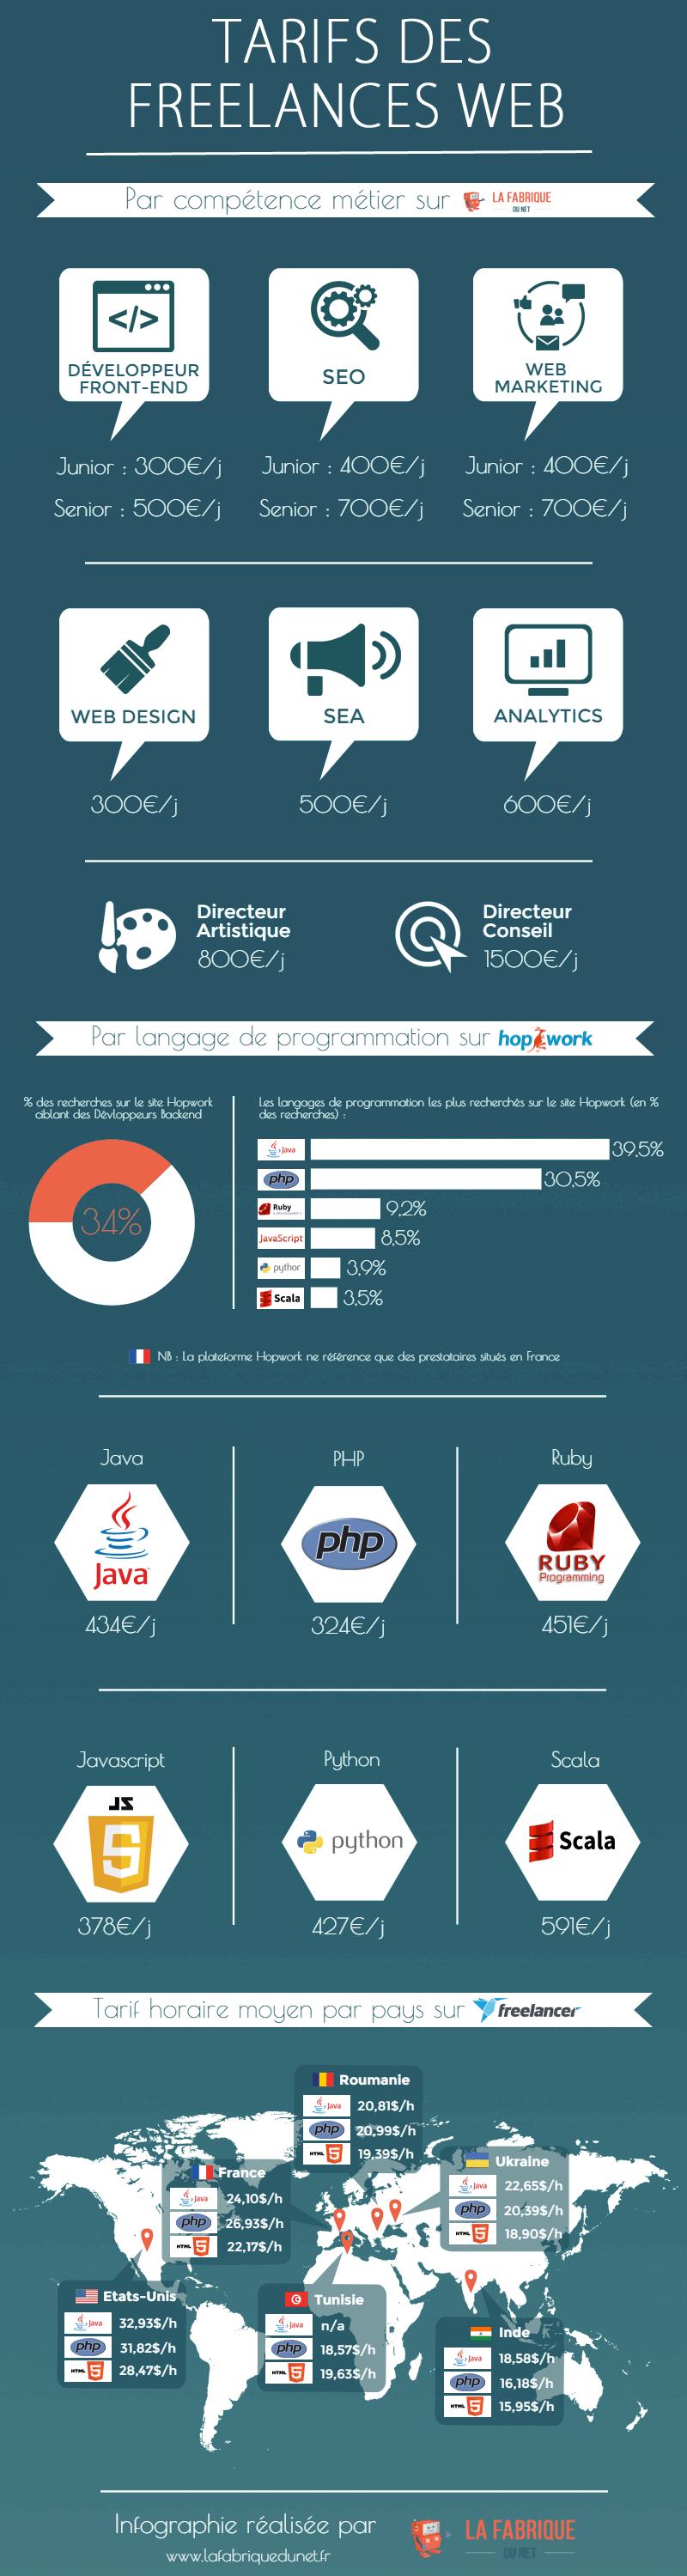 freelances tarifs 2015 france